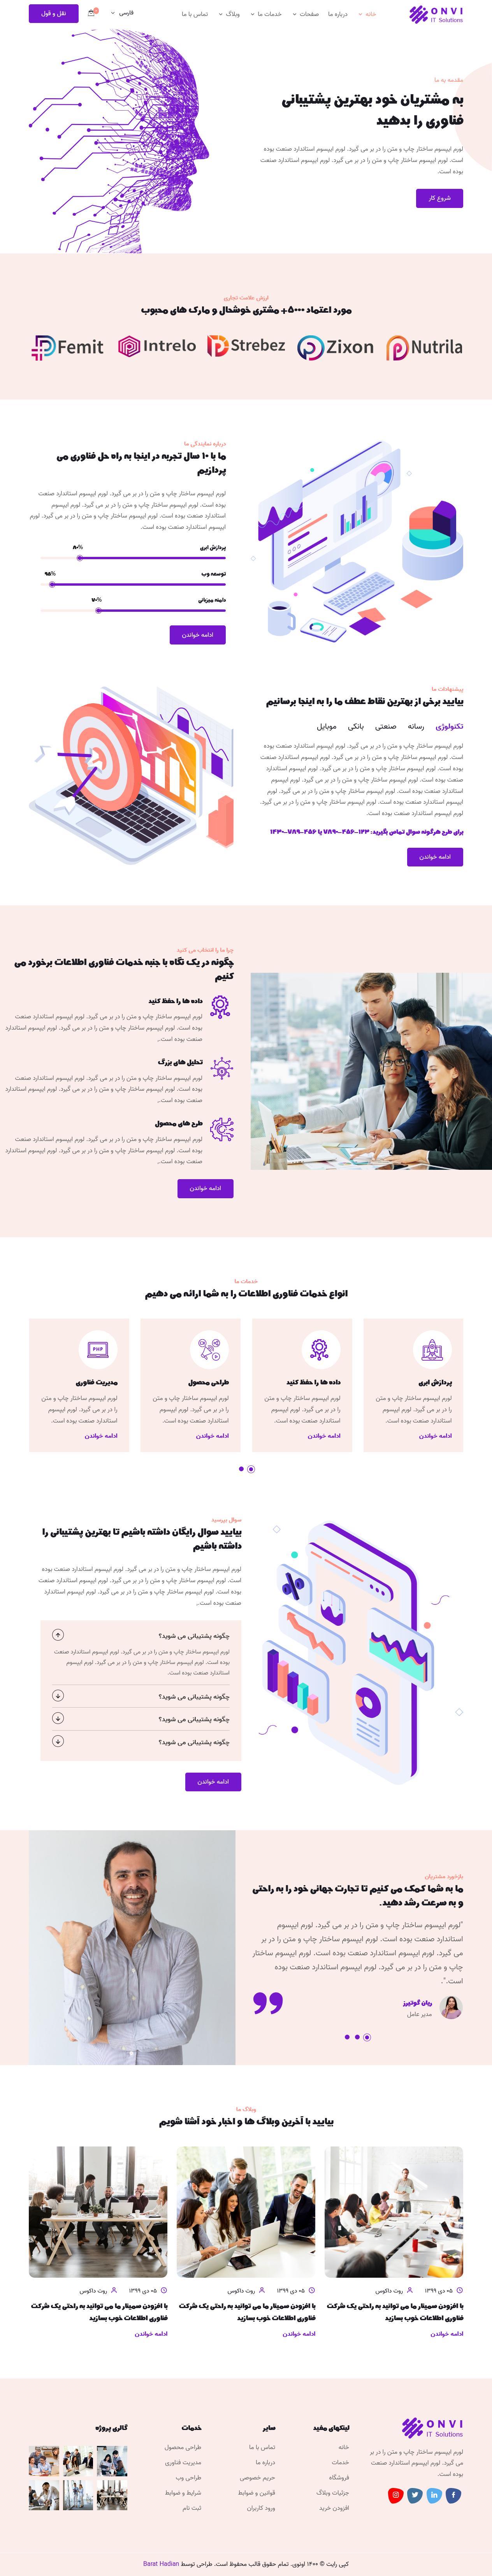 قالب HTML شرکتی خدمات دیجیتال و فناوری اونوی